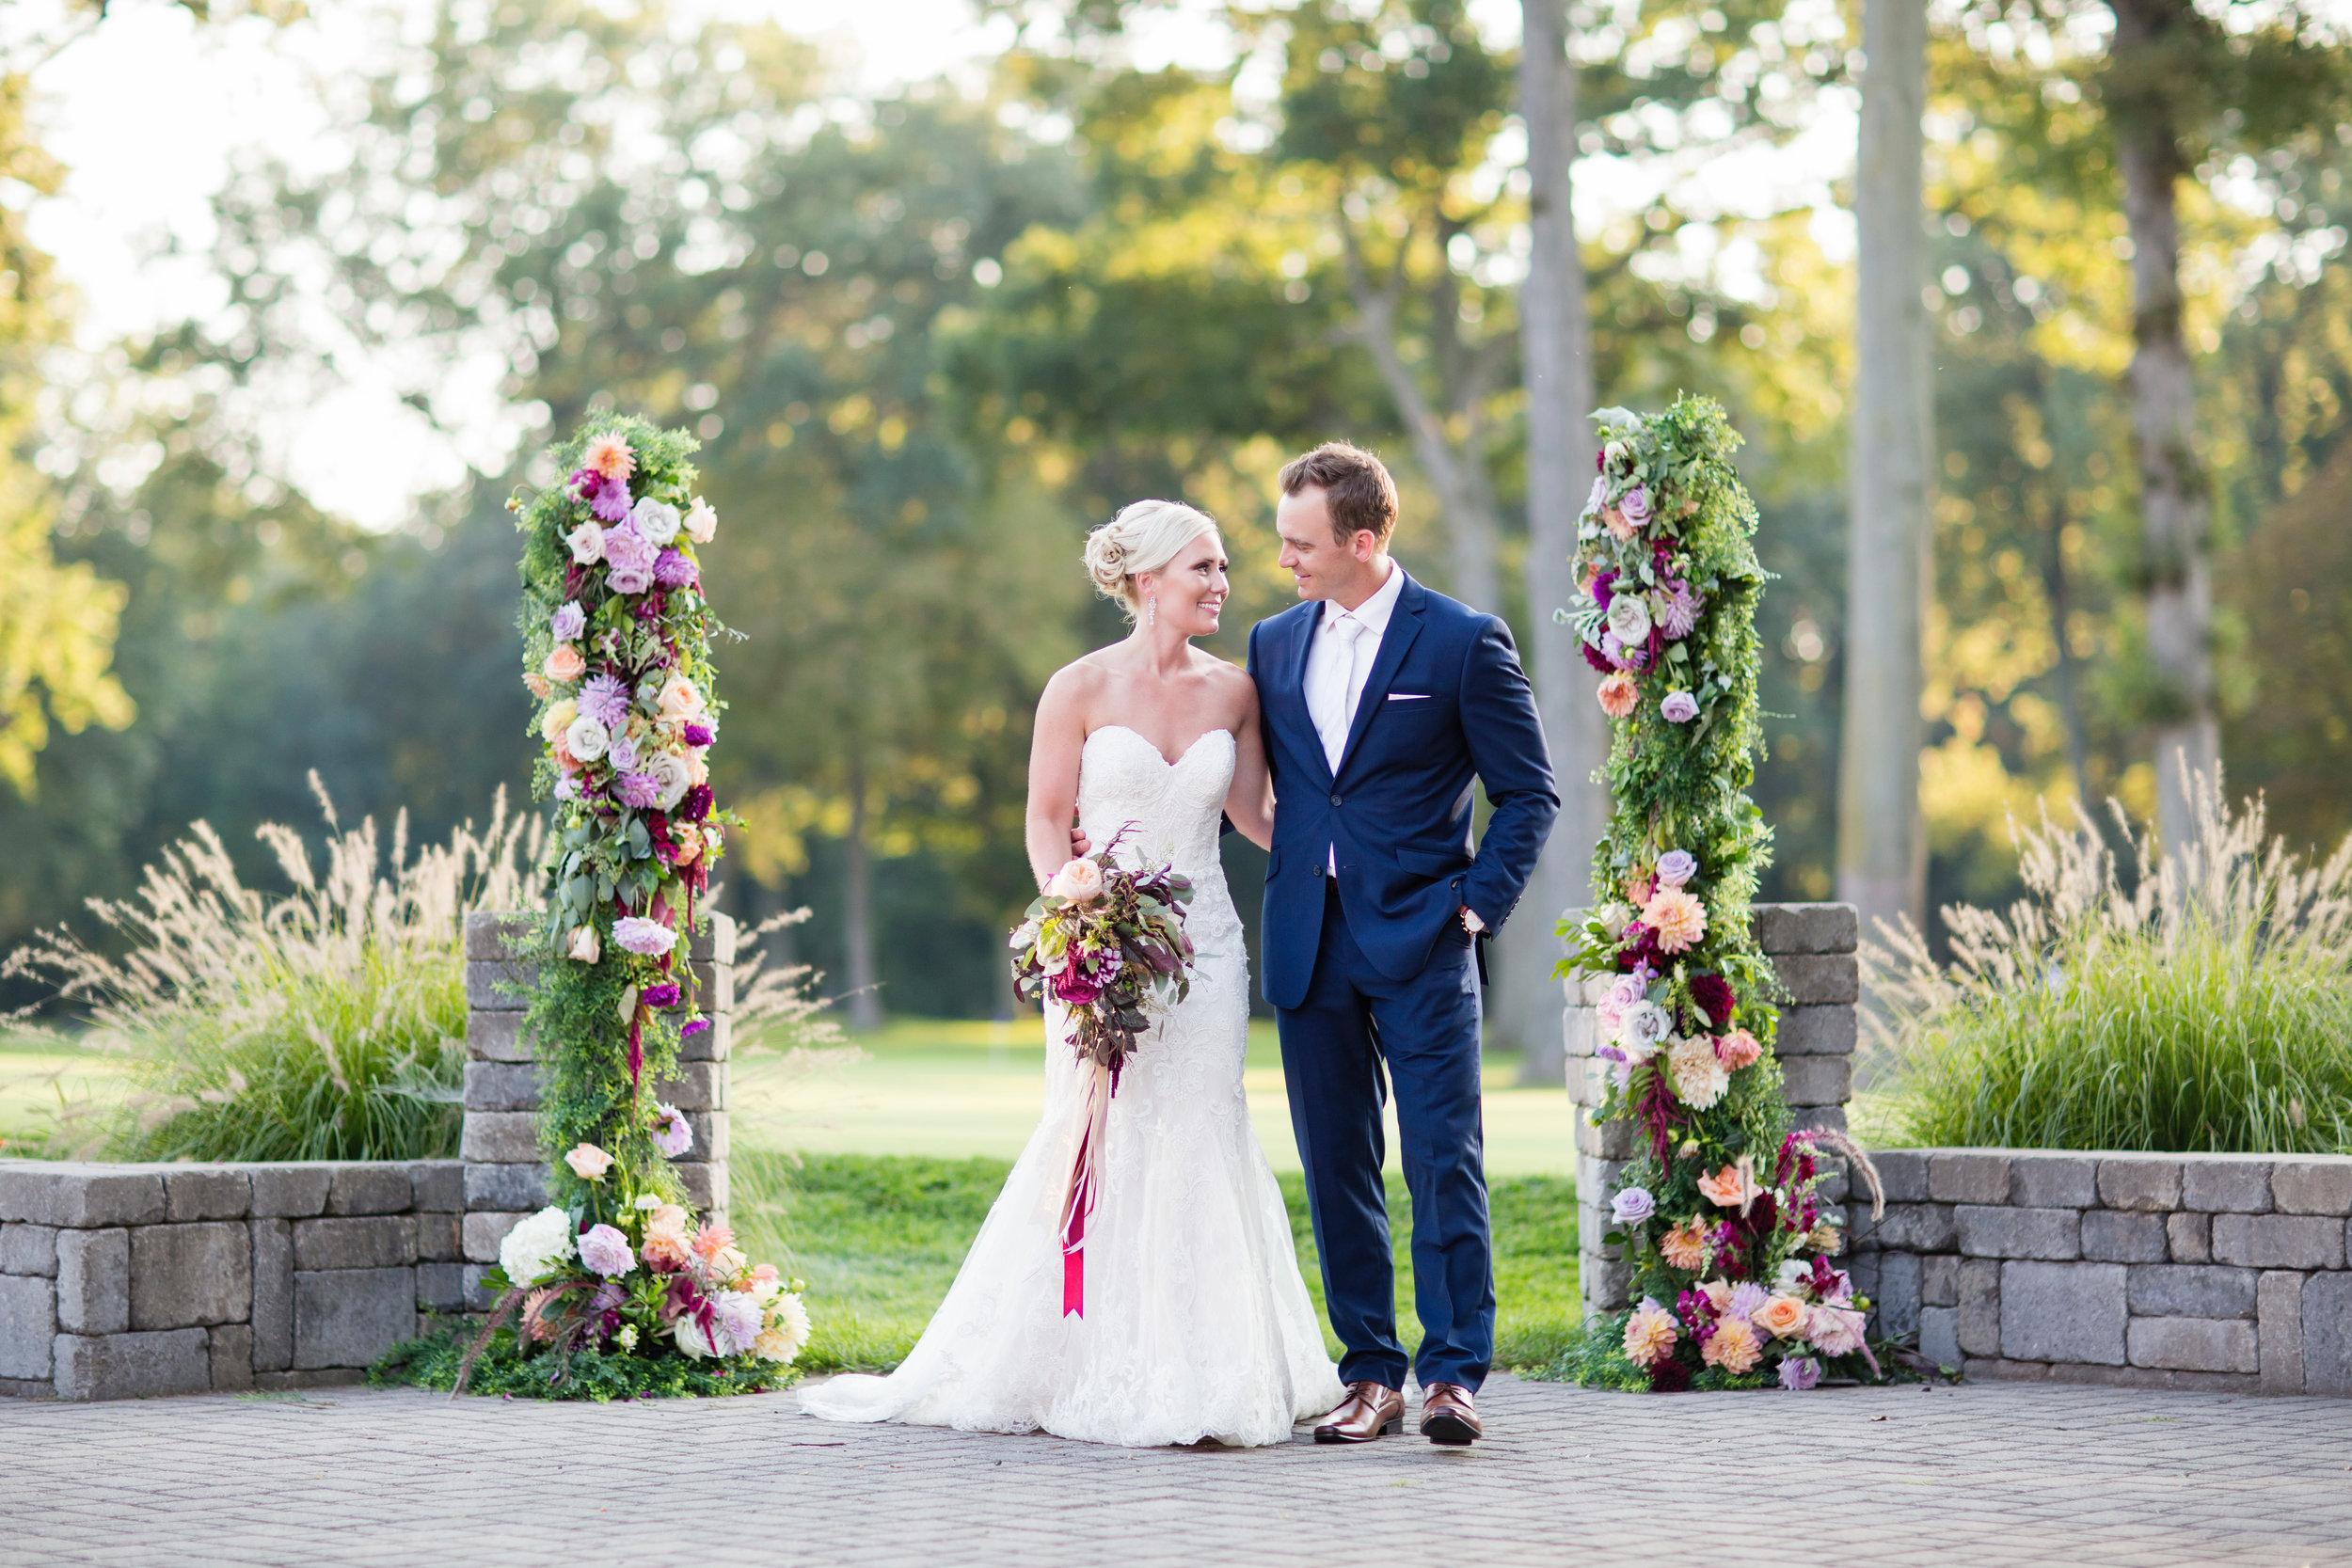 stylish-wedding-photography-windsor-toronto-ontario-wedding-photographer-winery-eryn-shea-photography-20.jpg